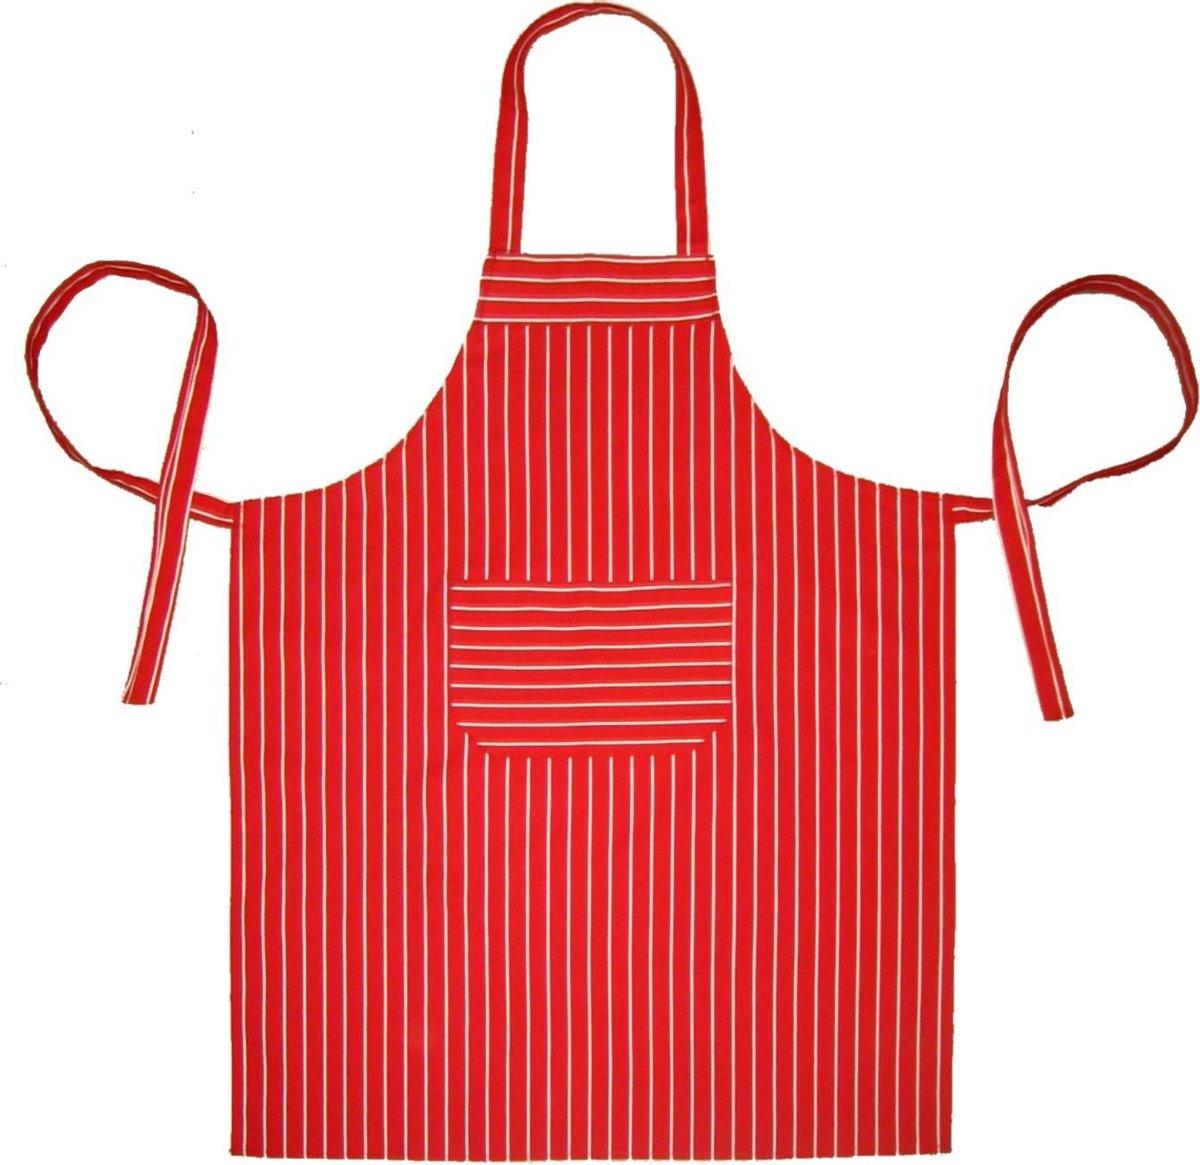 Homéé® Horeca suite Keukenschorten BBQ BIB Apron - rode streep - 70x100 cm - 2 stuks